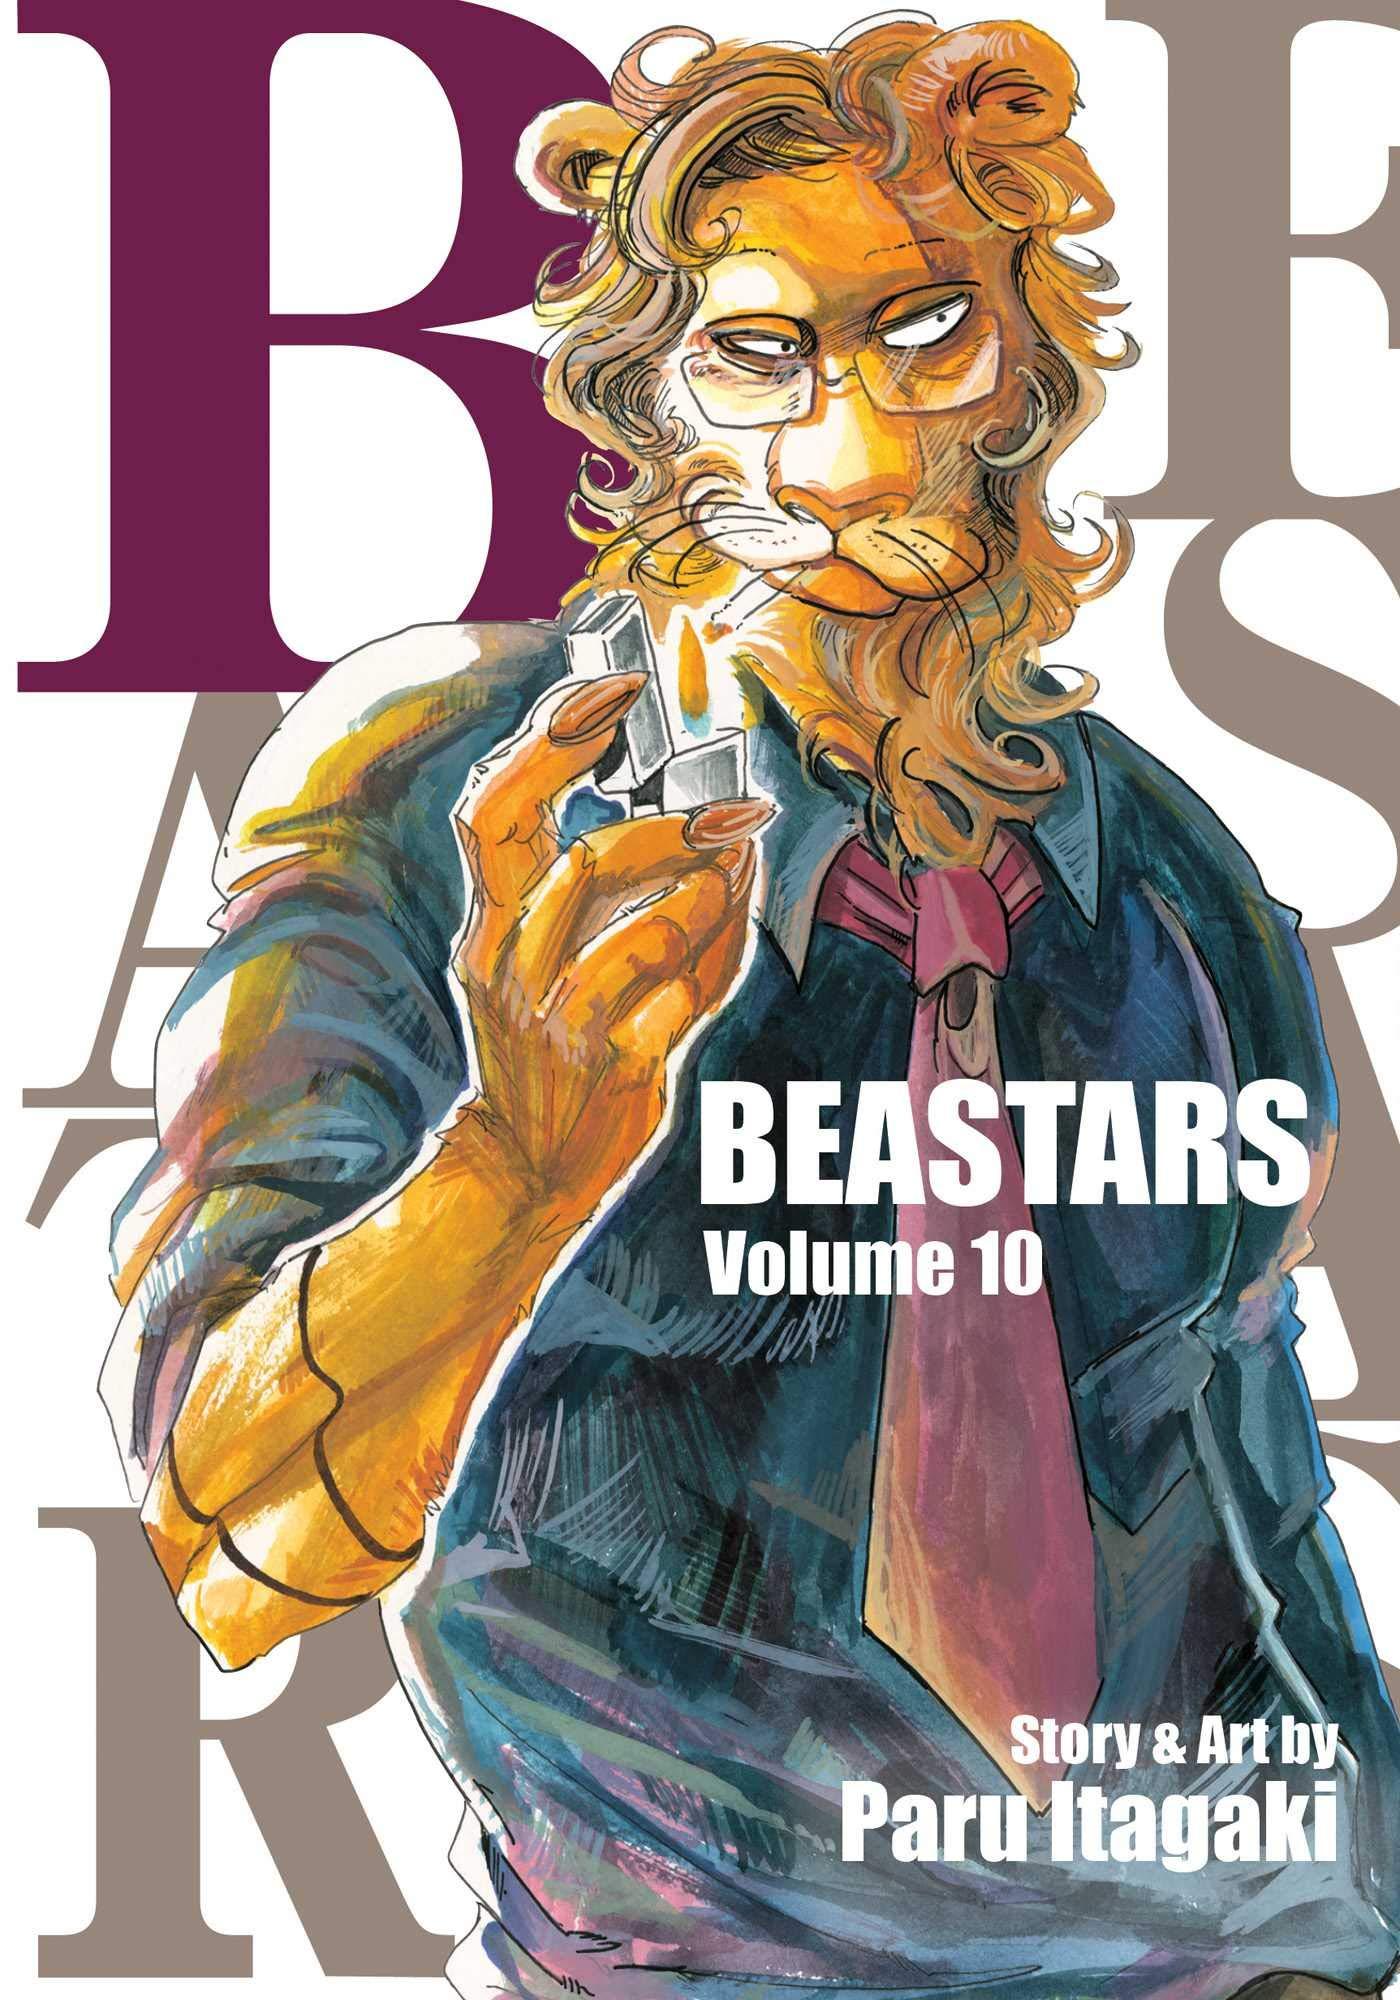 BEASTARS, Vol. 10 (10)